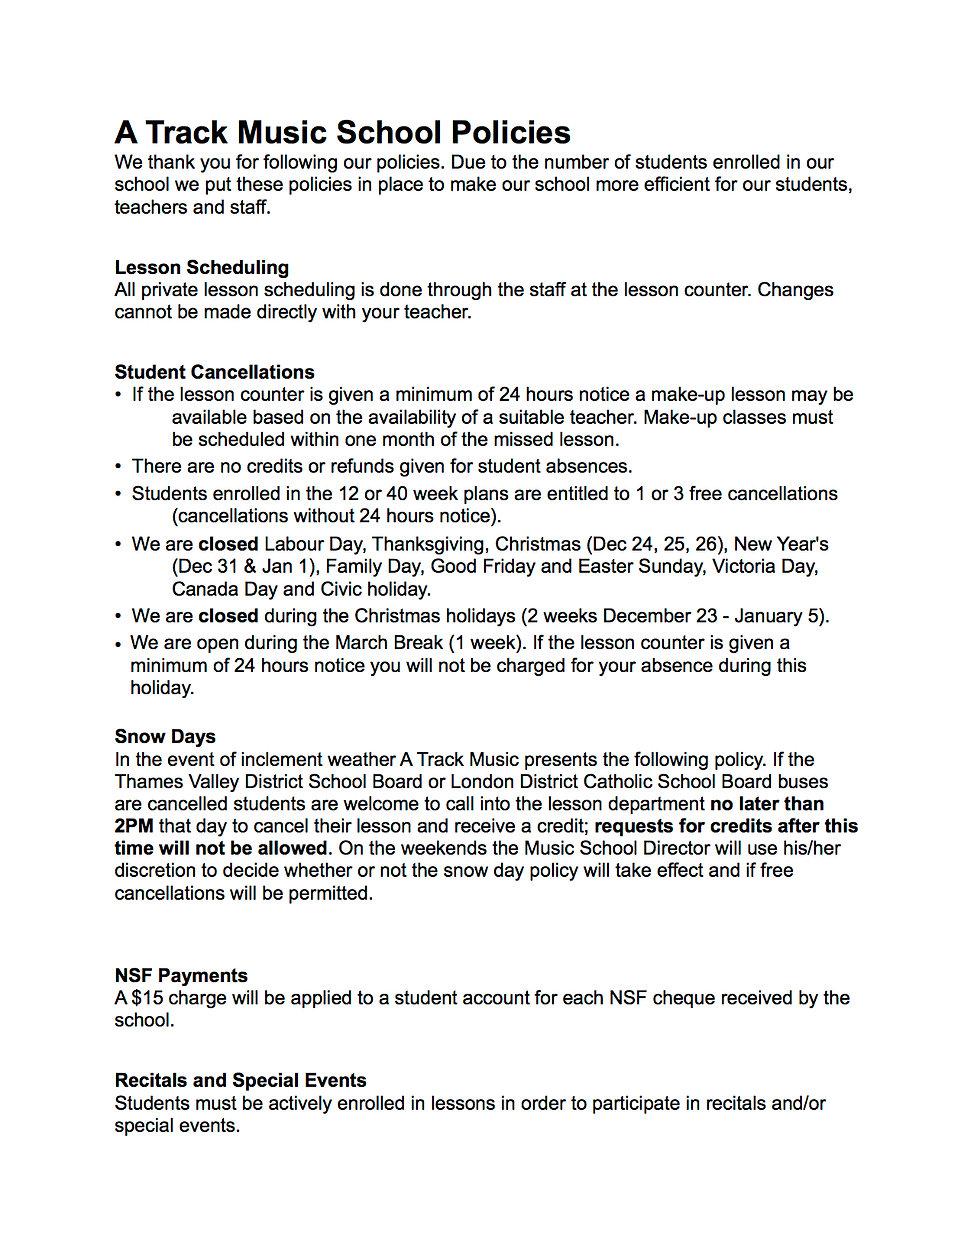 A Track Music School Policies.jpg